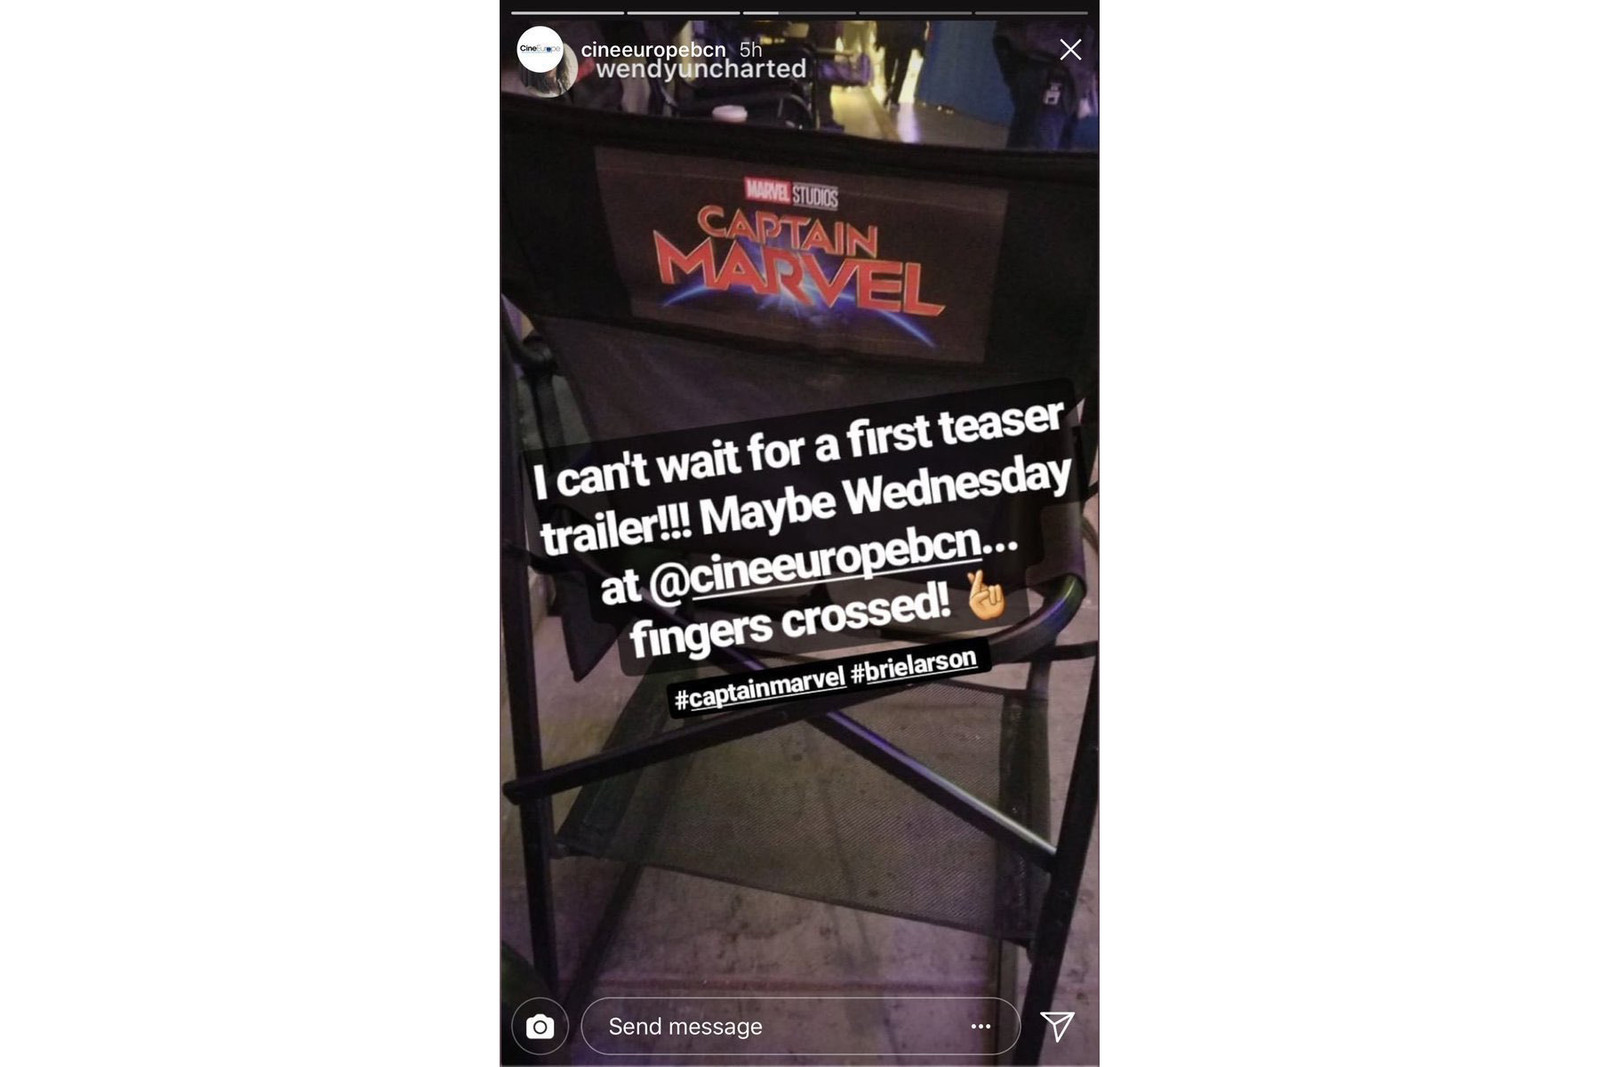 《Captain Marvel》本周或將發放首波電影預告片